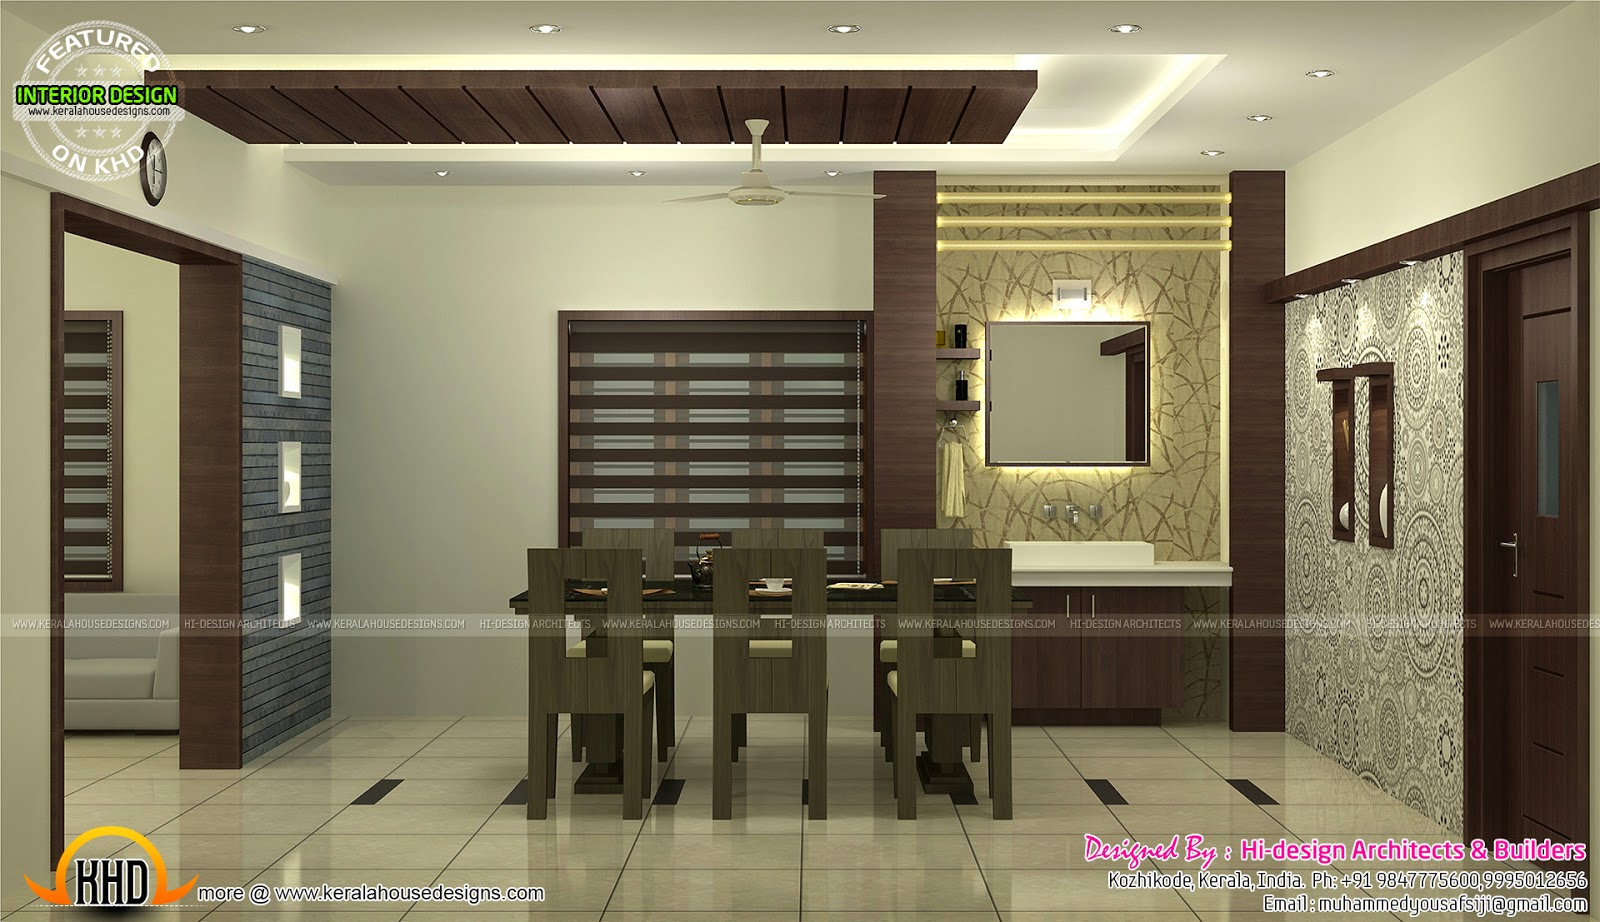 Interior Design In House The Interior Designer Deentight